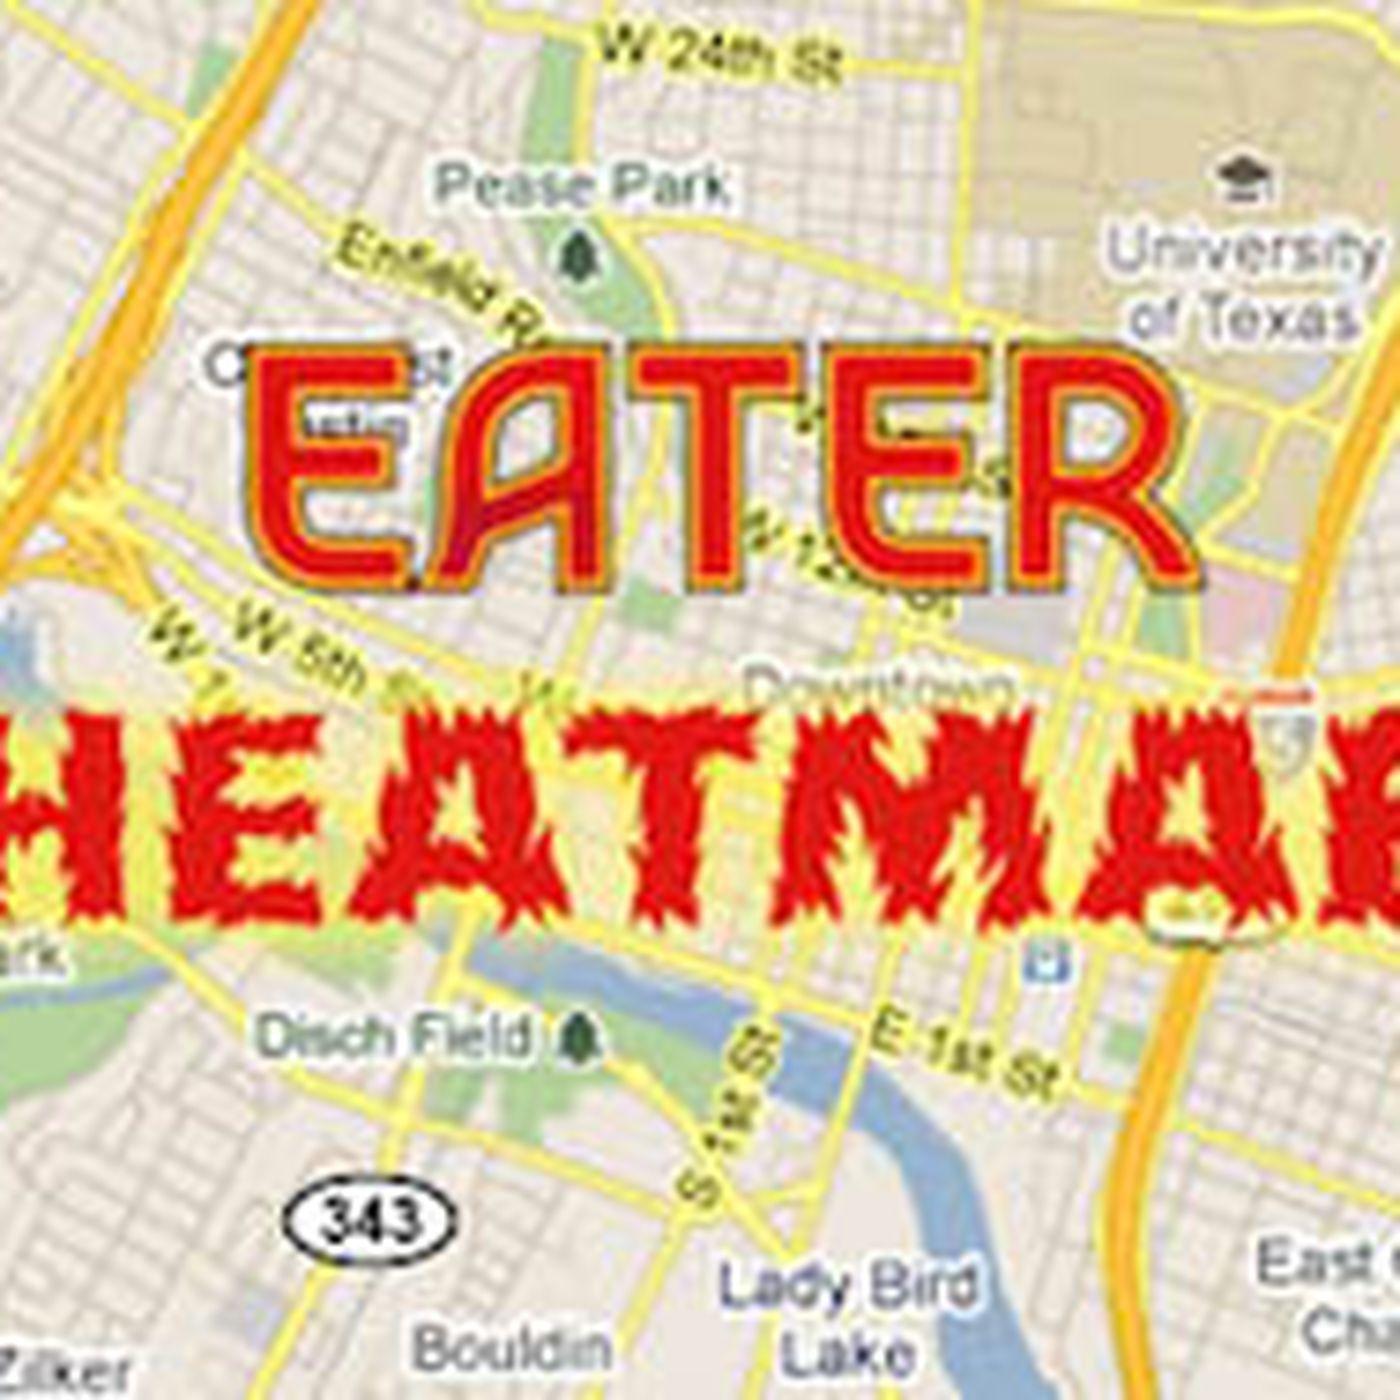 austin eater heat map Eater Austin Heatmap Where To Eat Right Now Eater Austin austin eater heat map